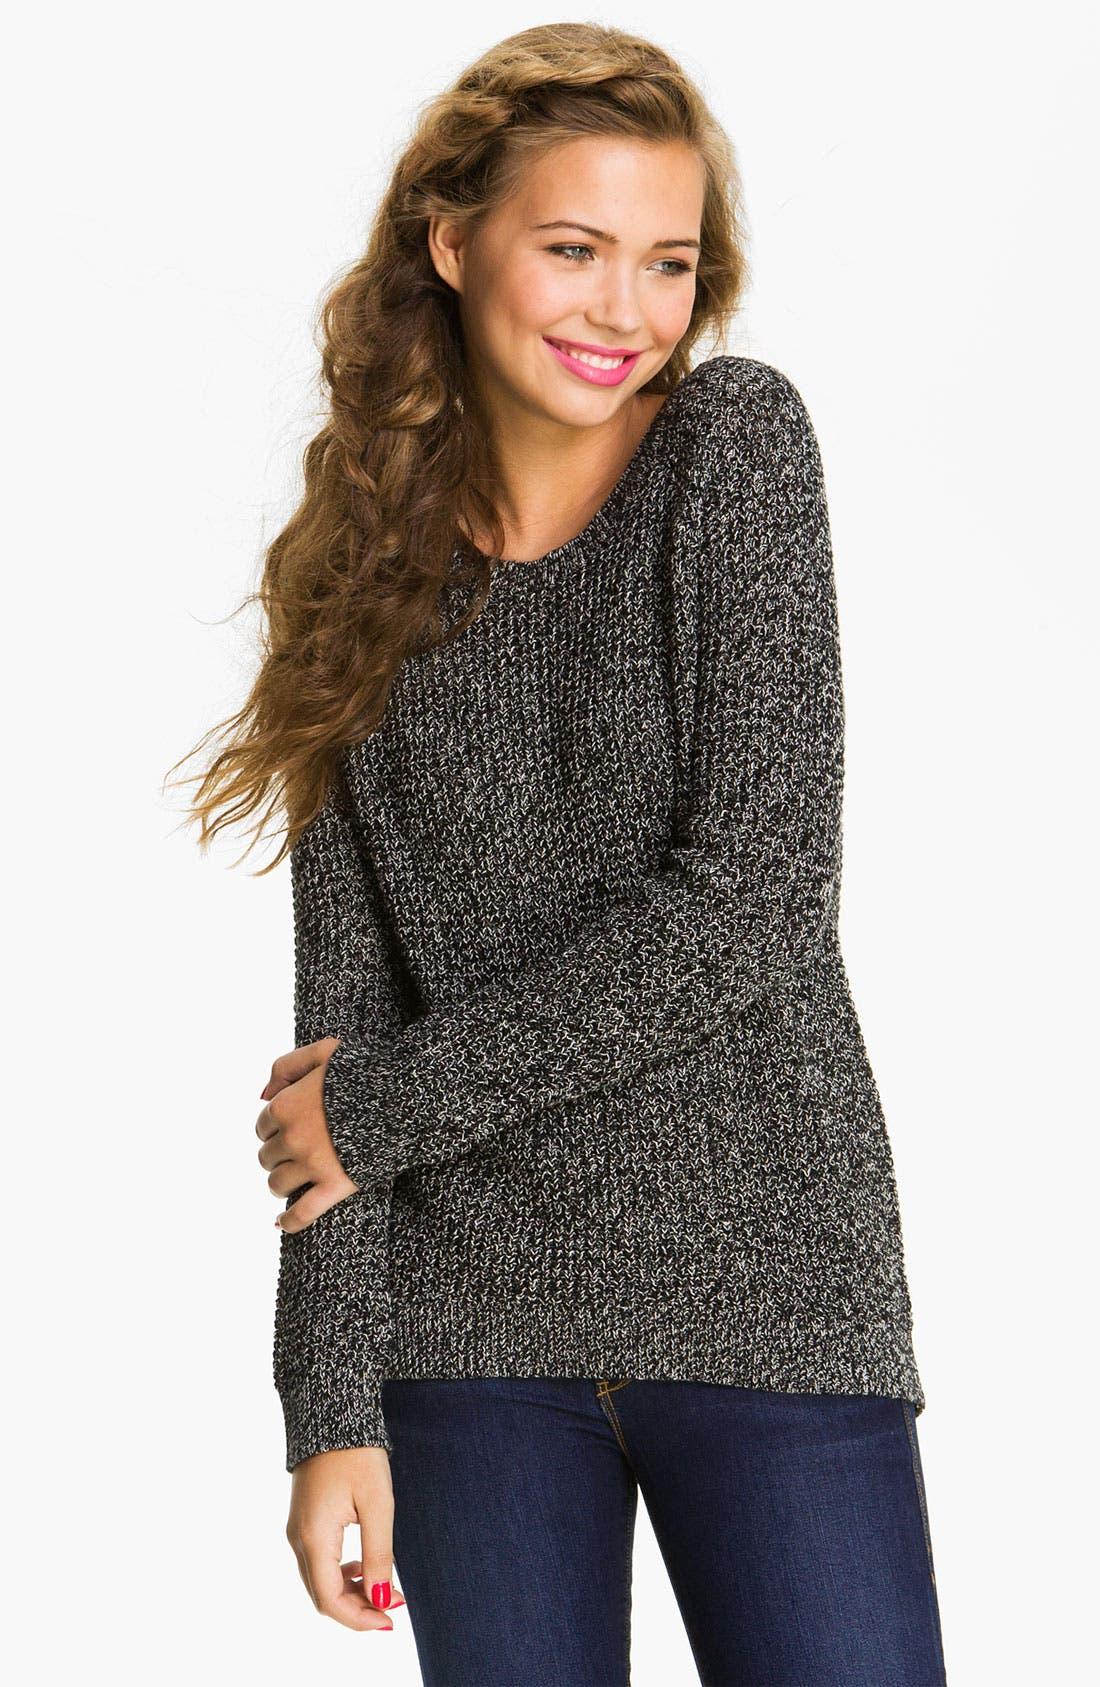 Alternate Image 1 Selected - Rubbish® Waffle Knit Sweater (Juniors)